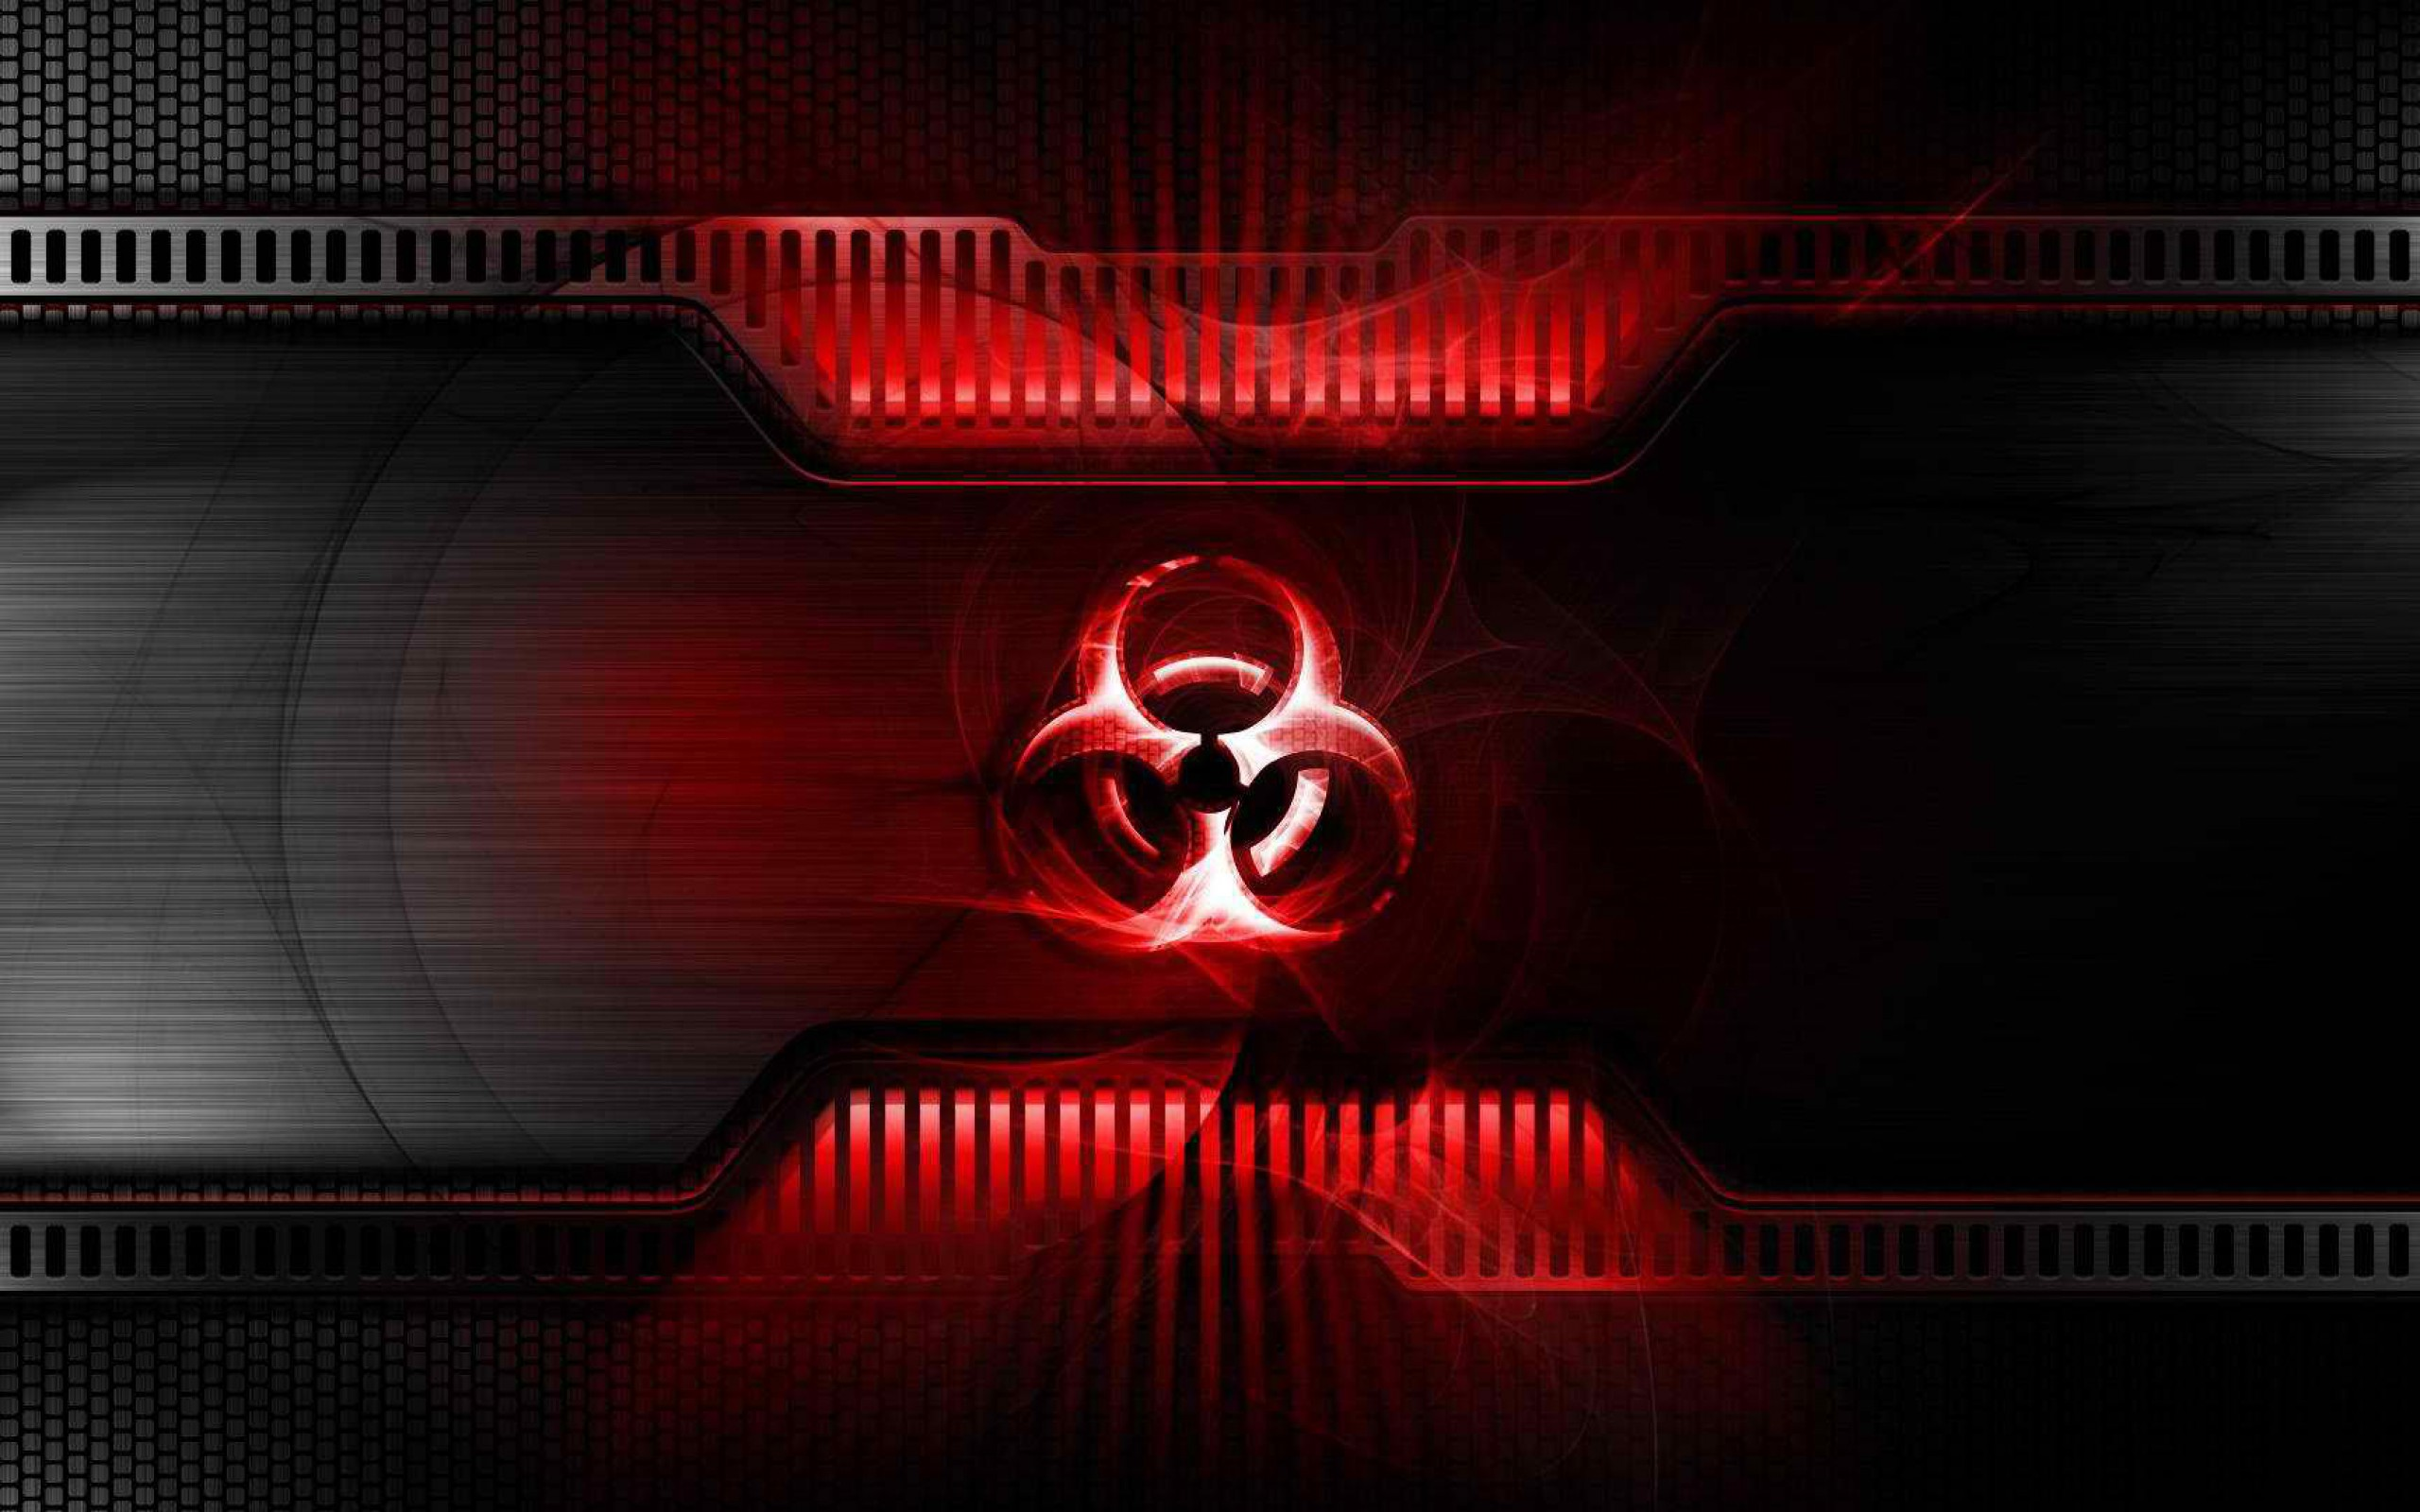 Biohazard Fond d'écran HD | Arrière-Plan | 2560x1600 | ID:371301 -  Wallpaper Abyss